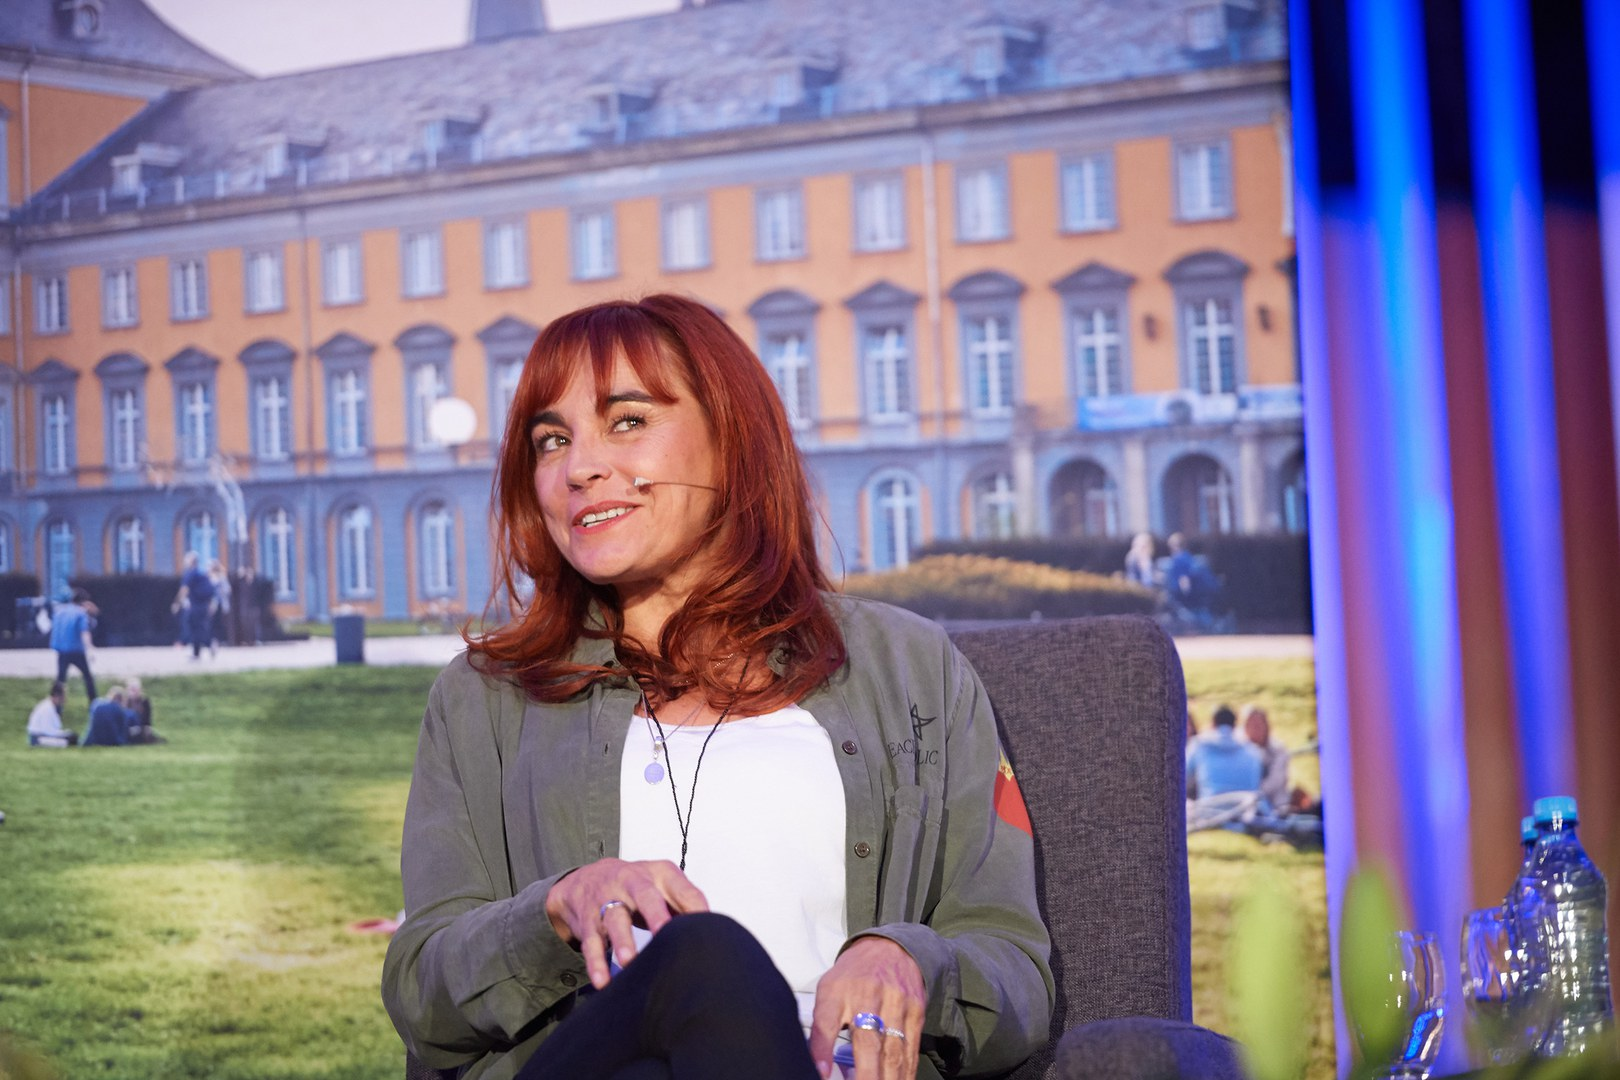 Moderatorin Diana Eichhorn